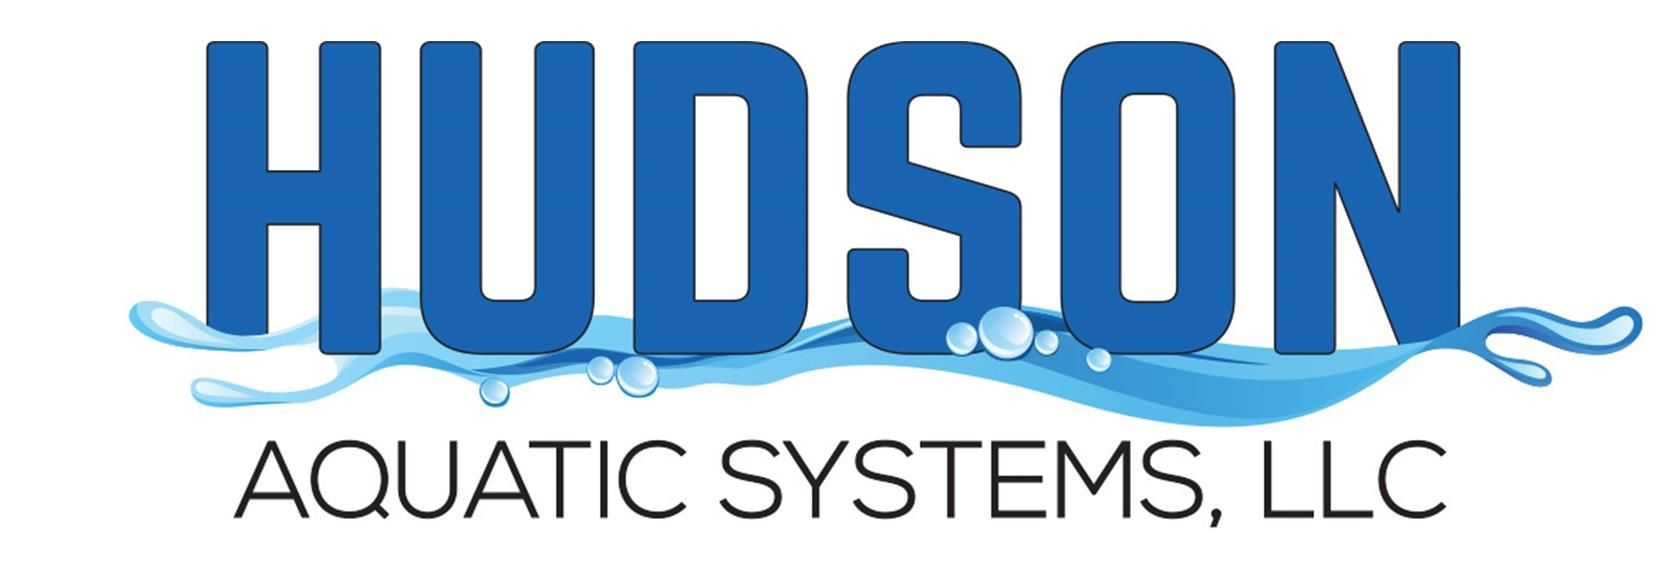 Hudson Aquatic Systems, LLC